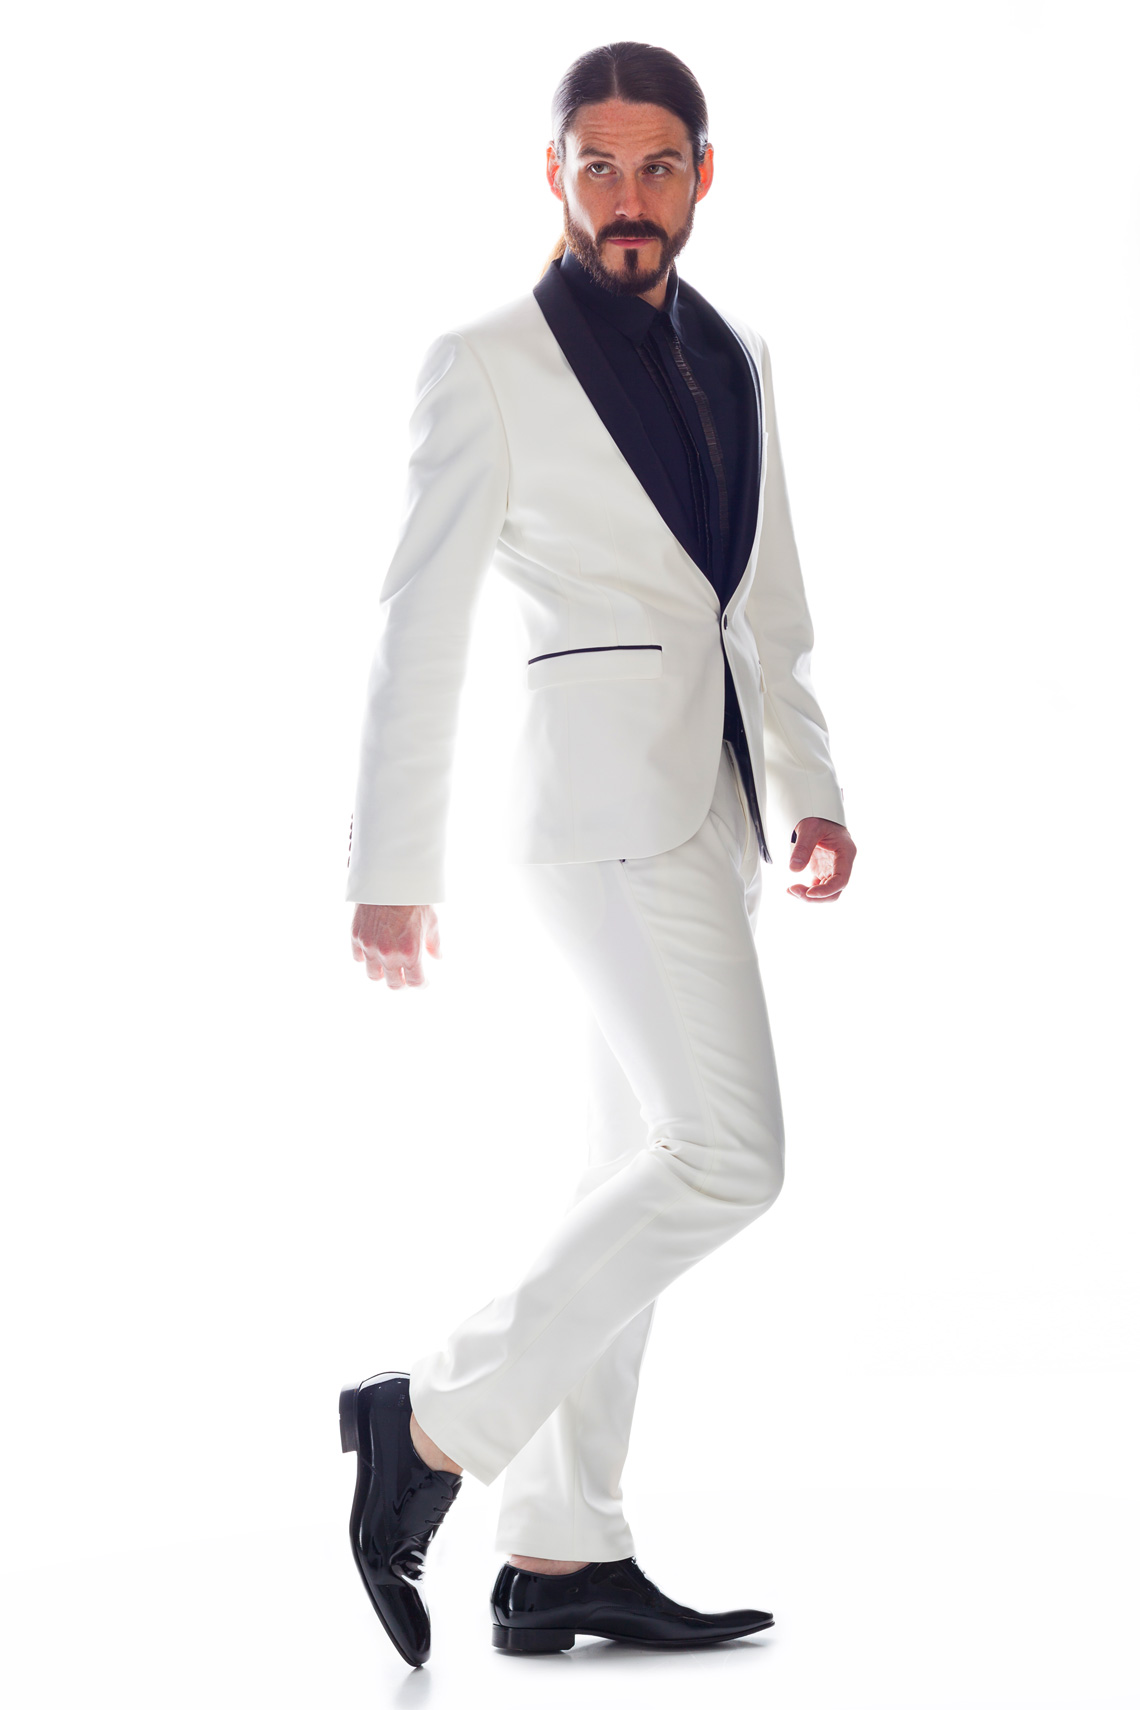 Kaisers-neue-Kleider-Fashionblog-Outfit-Weisser-Anzug-Hemd-The-Kooples